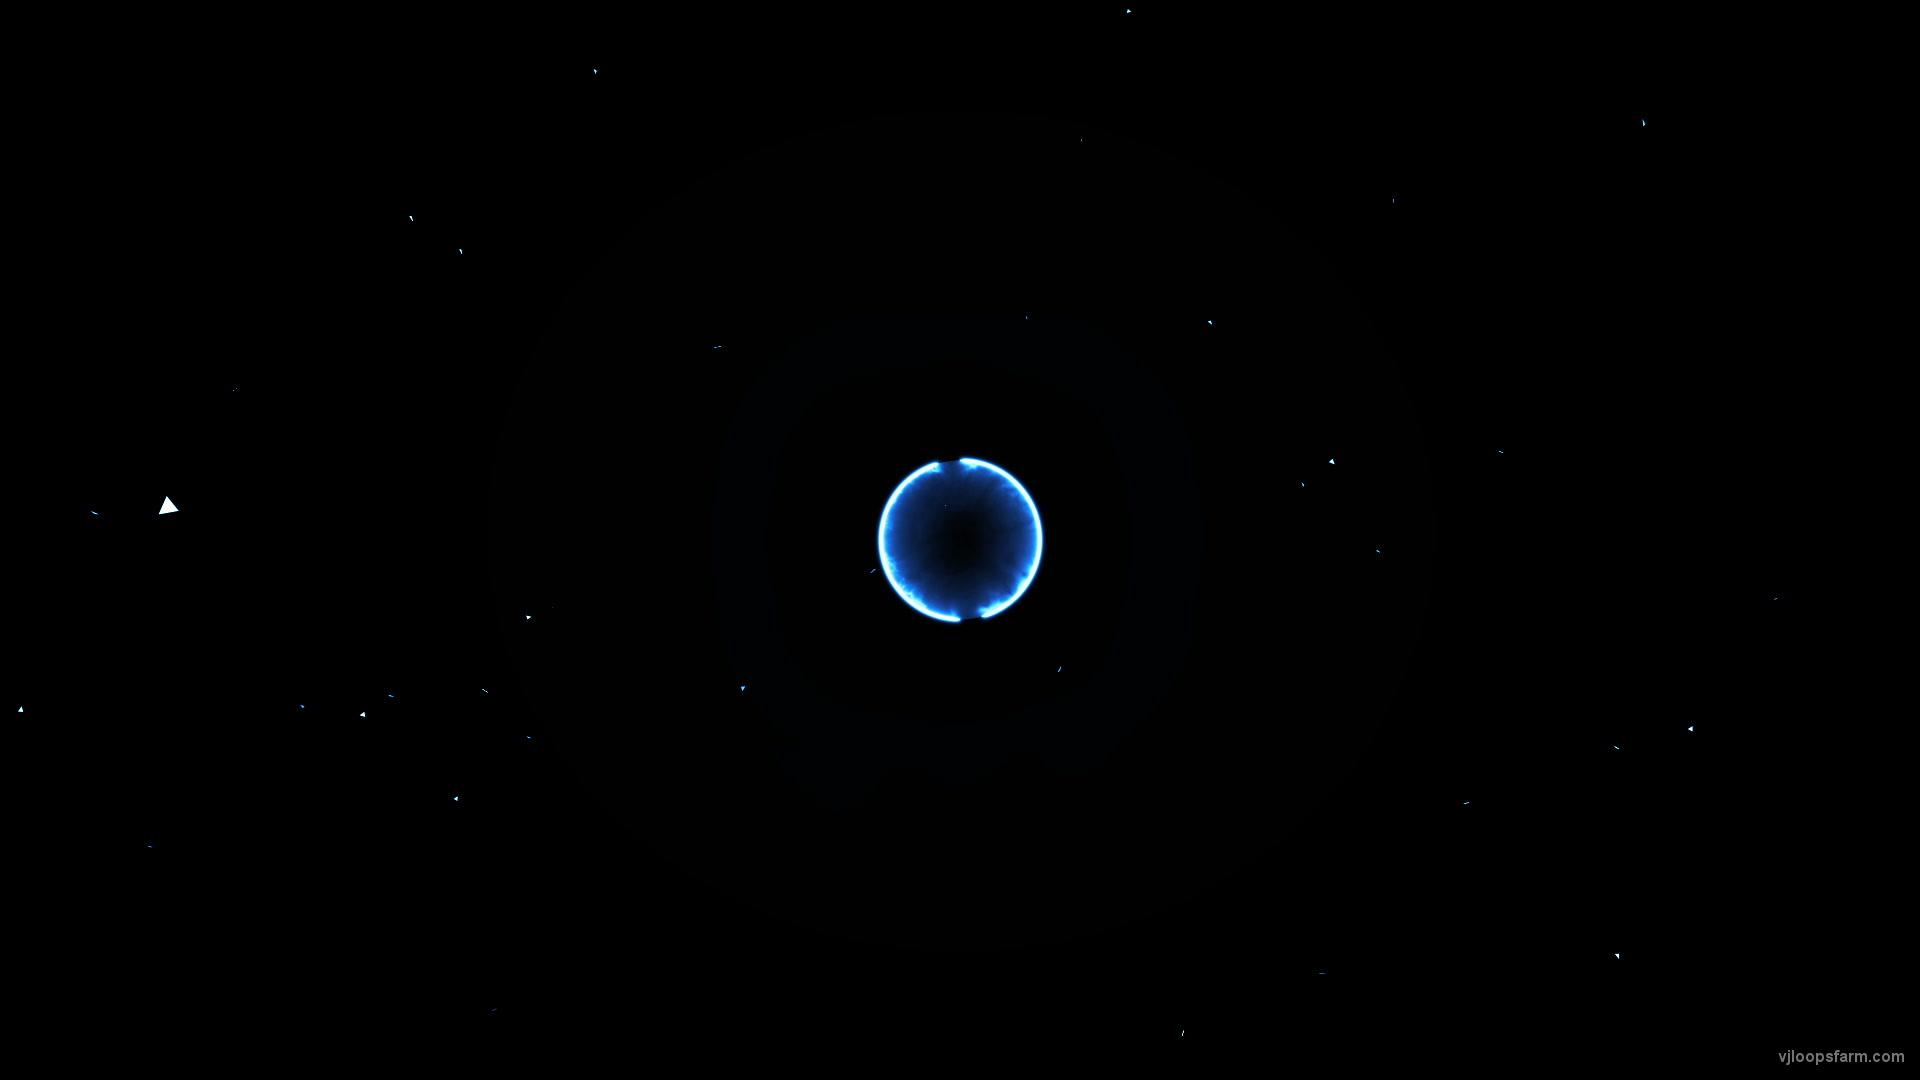 vj video background Space_blue_edm_beats_shockwave_explosion_fullhd_60fps_vj_loop_003